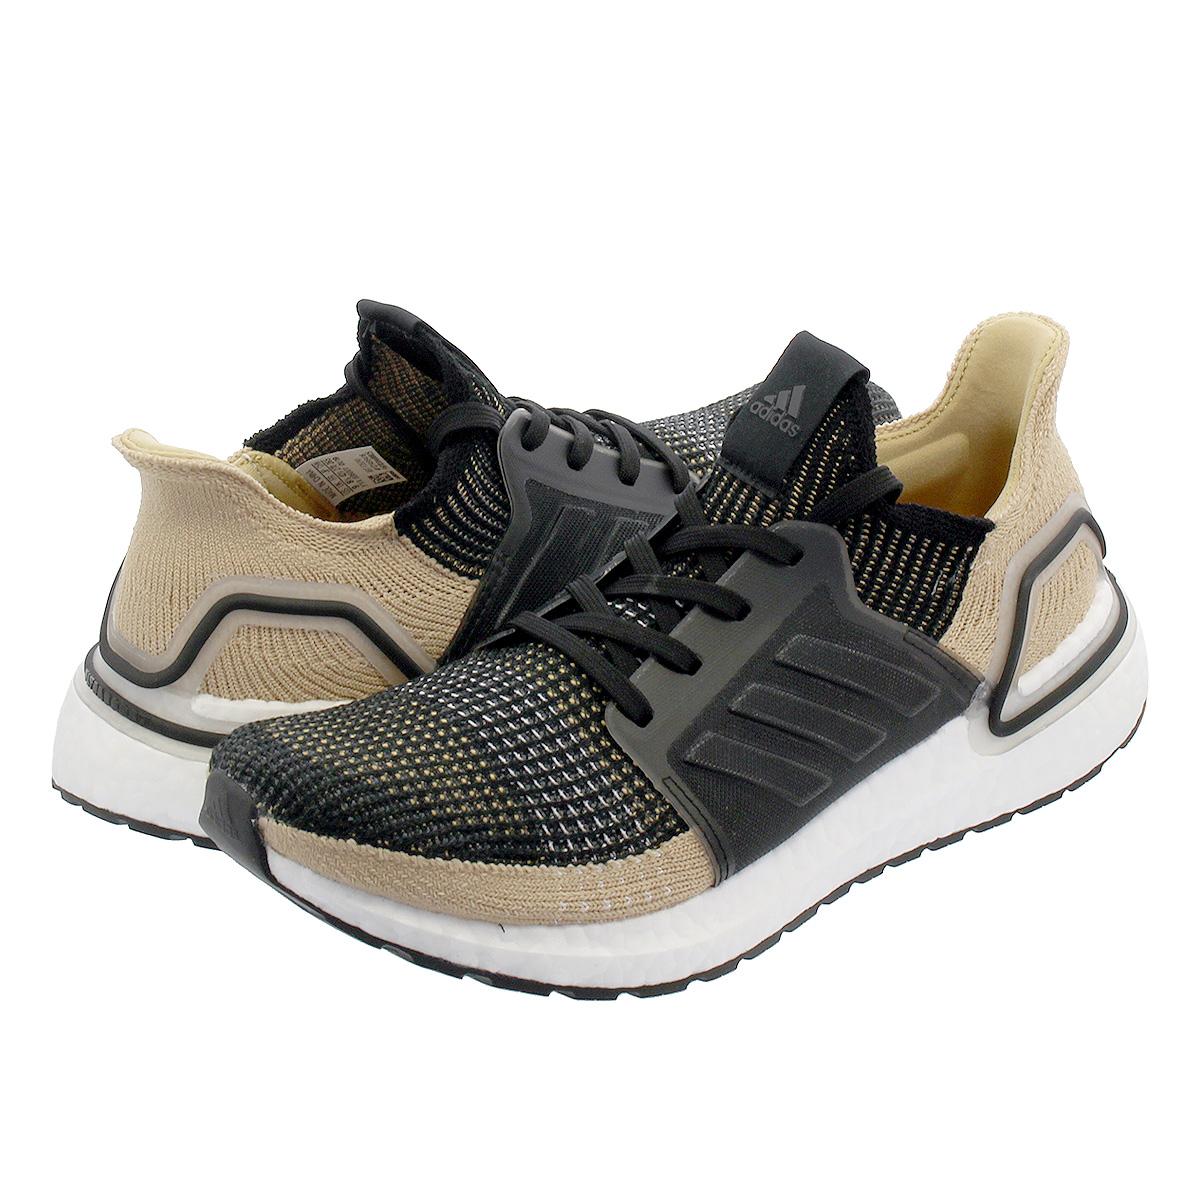 Kinetics: adidas UltraBOOST 19 (Adidas ultra boost 19) CORE